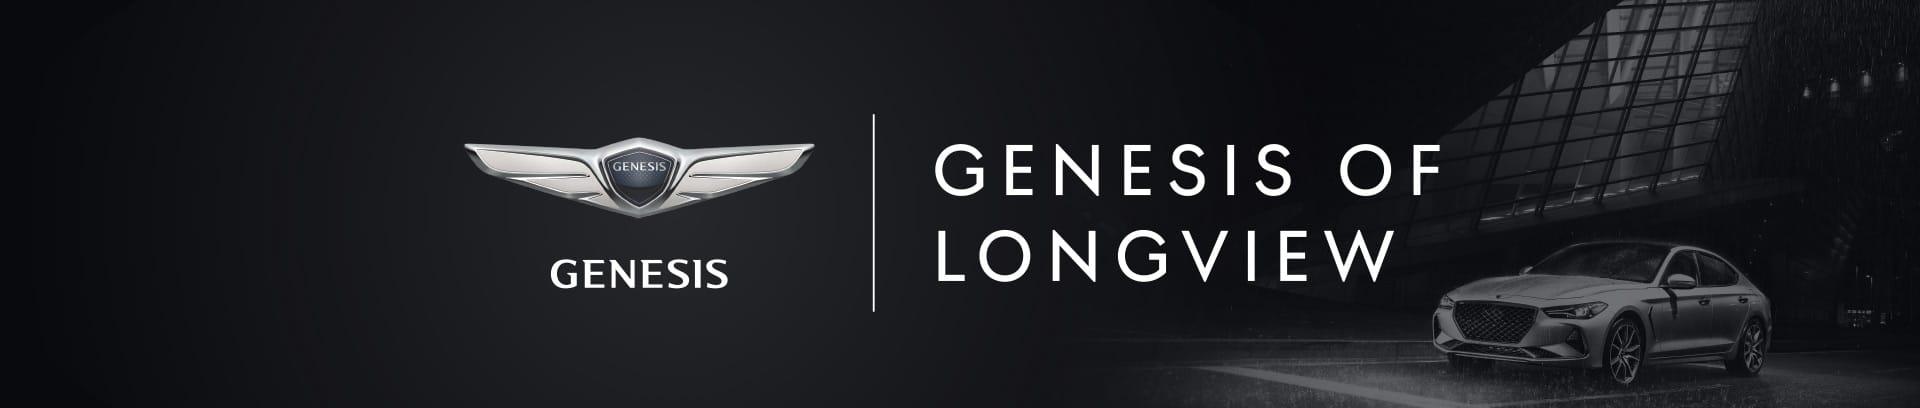 Genesis of Longview